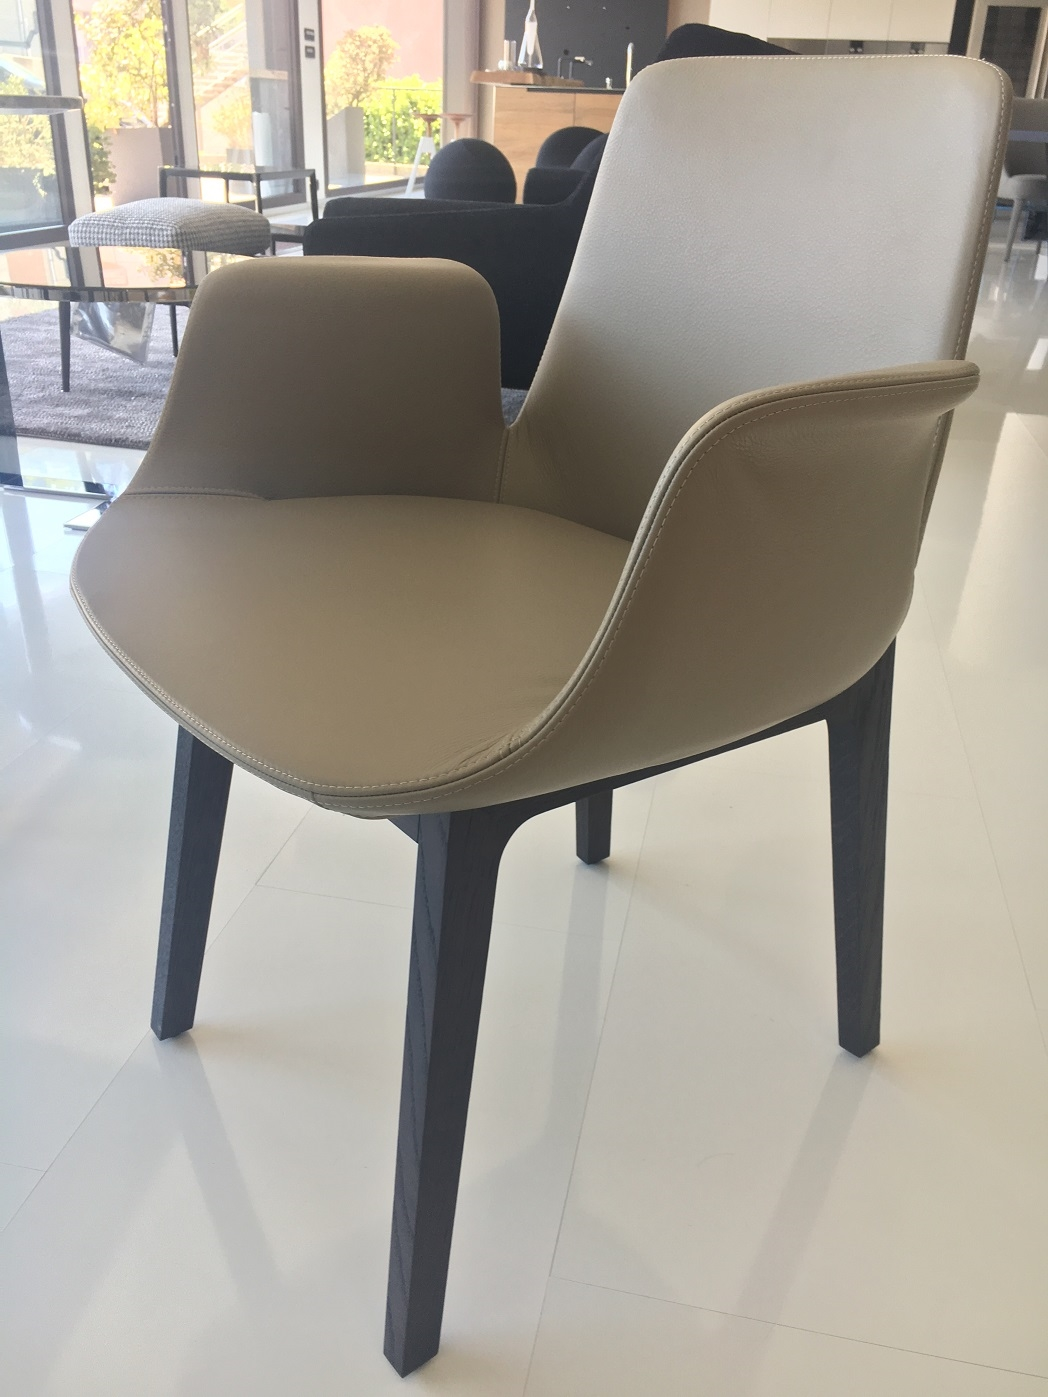 Sedia poliform ventura scontato del 43 sedie a prezzi for Poliform sedie